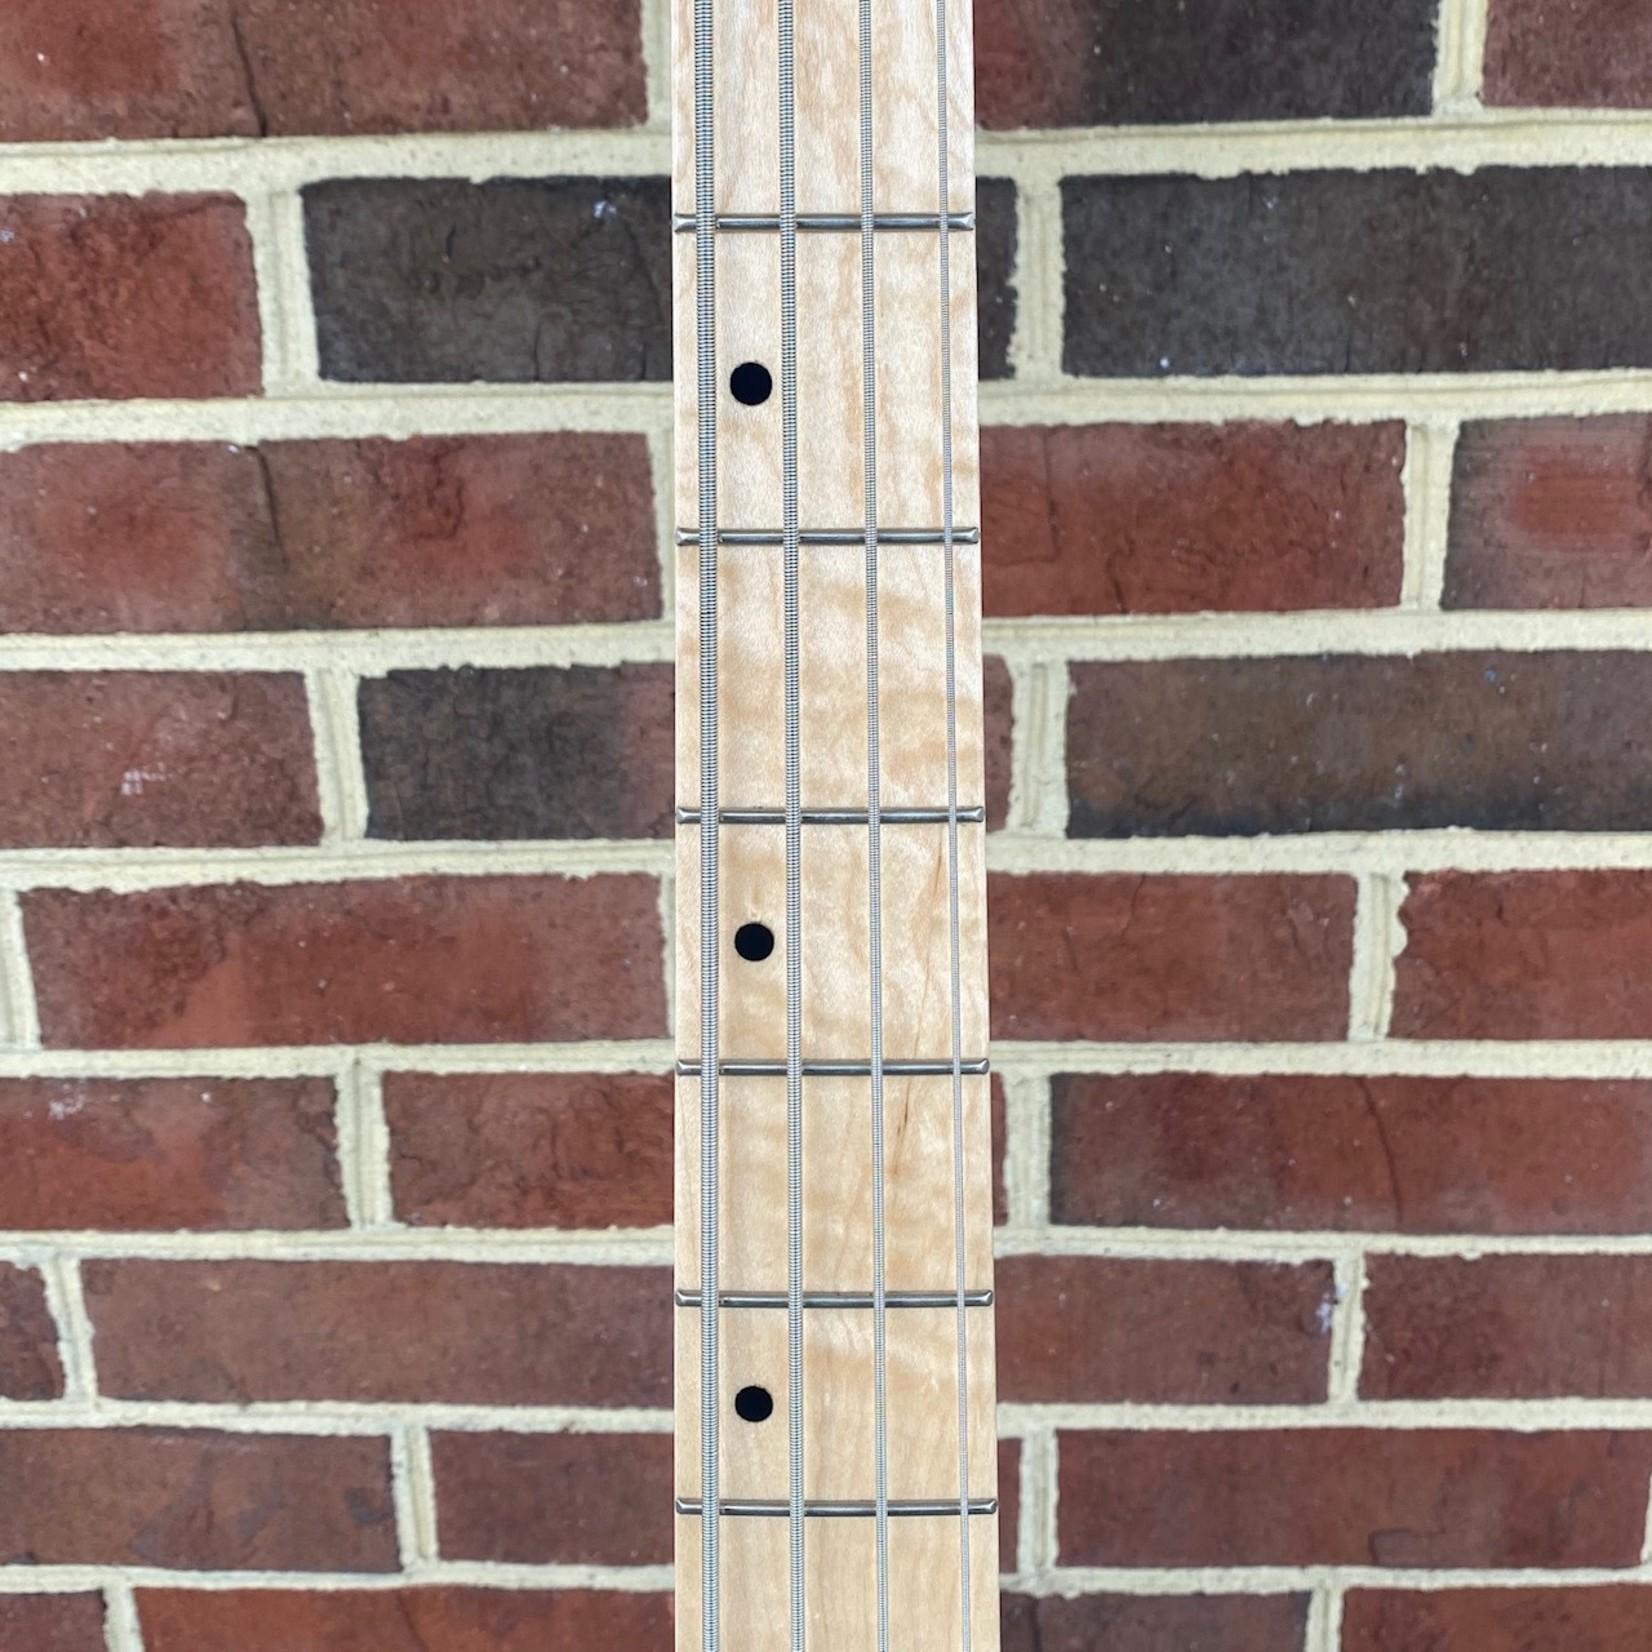 "Schecter Guitar Research Schecter J-4, Seafoam Green, Maple Fretboard, Schecter USA MonsterTone J pickups, Black Hardware, 16"" Radius"